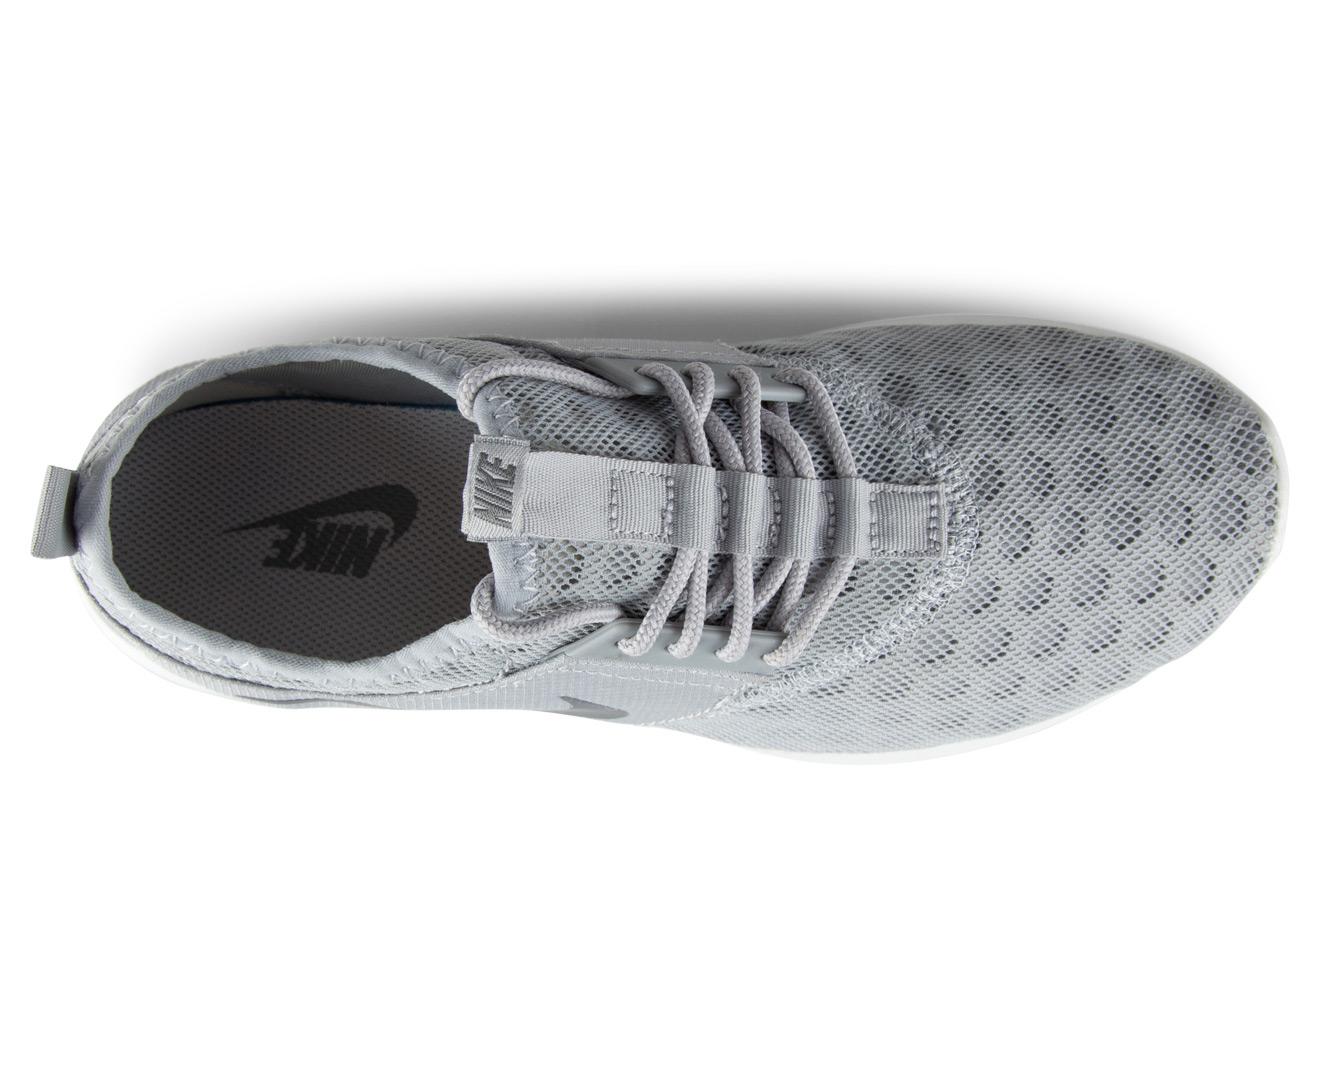 save off dd543 666f3 Nike Womens Juvenate Shoe - Wolf GreyCool GreyWhite  Catch.c